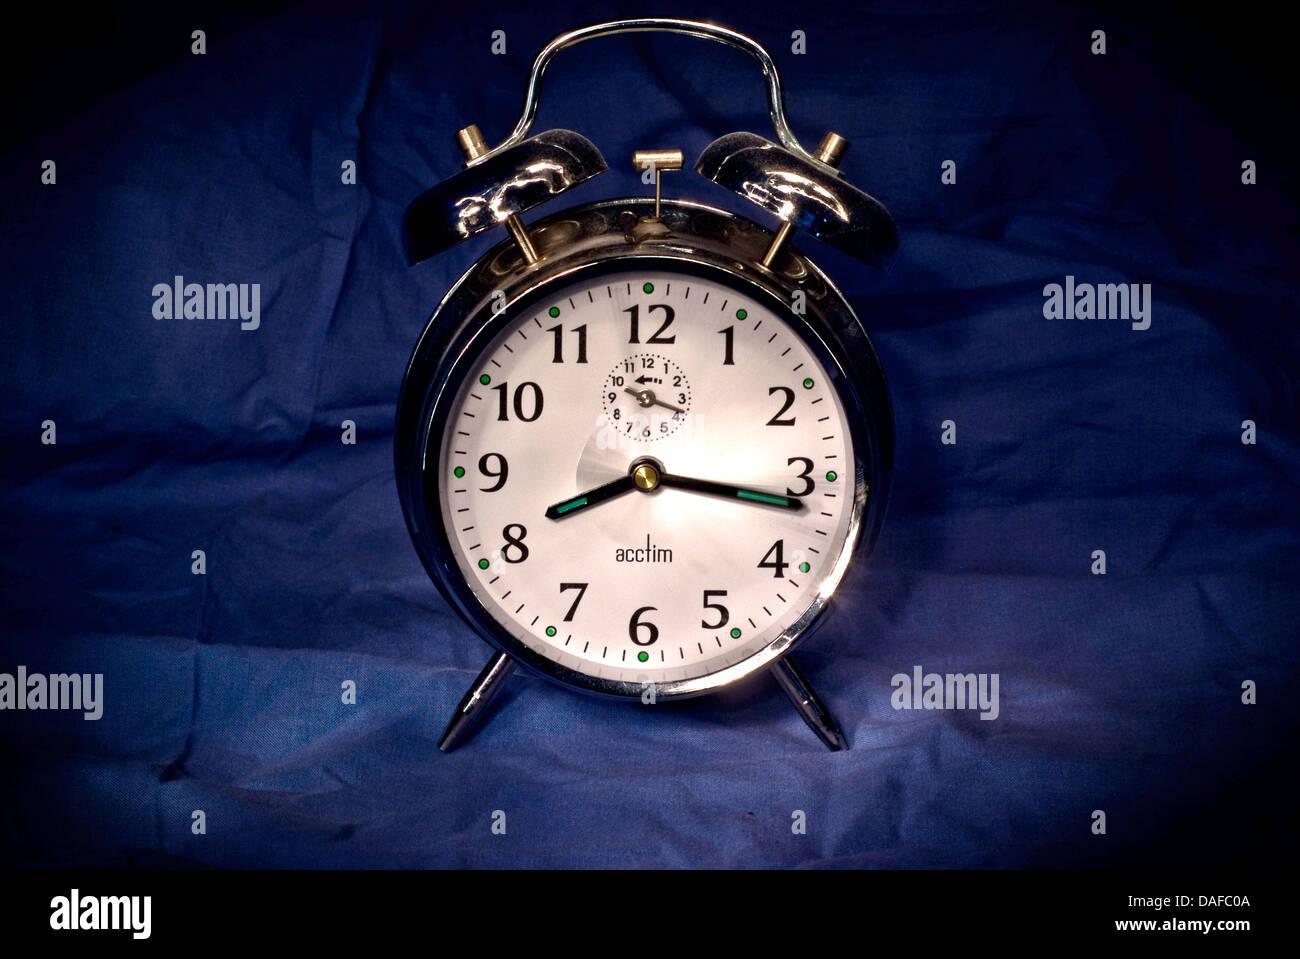 Alarm Clock Face - Stock Image